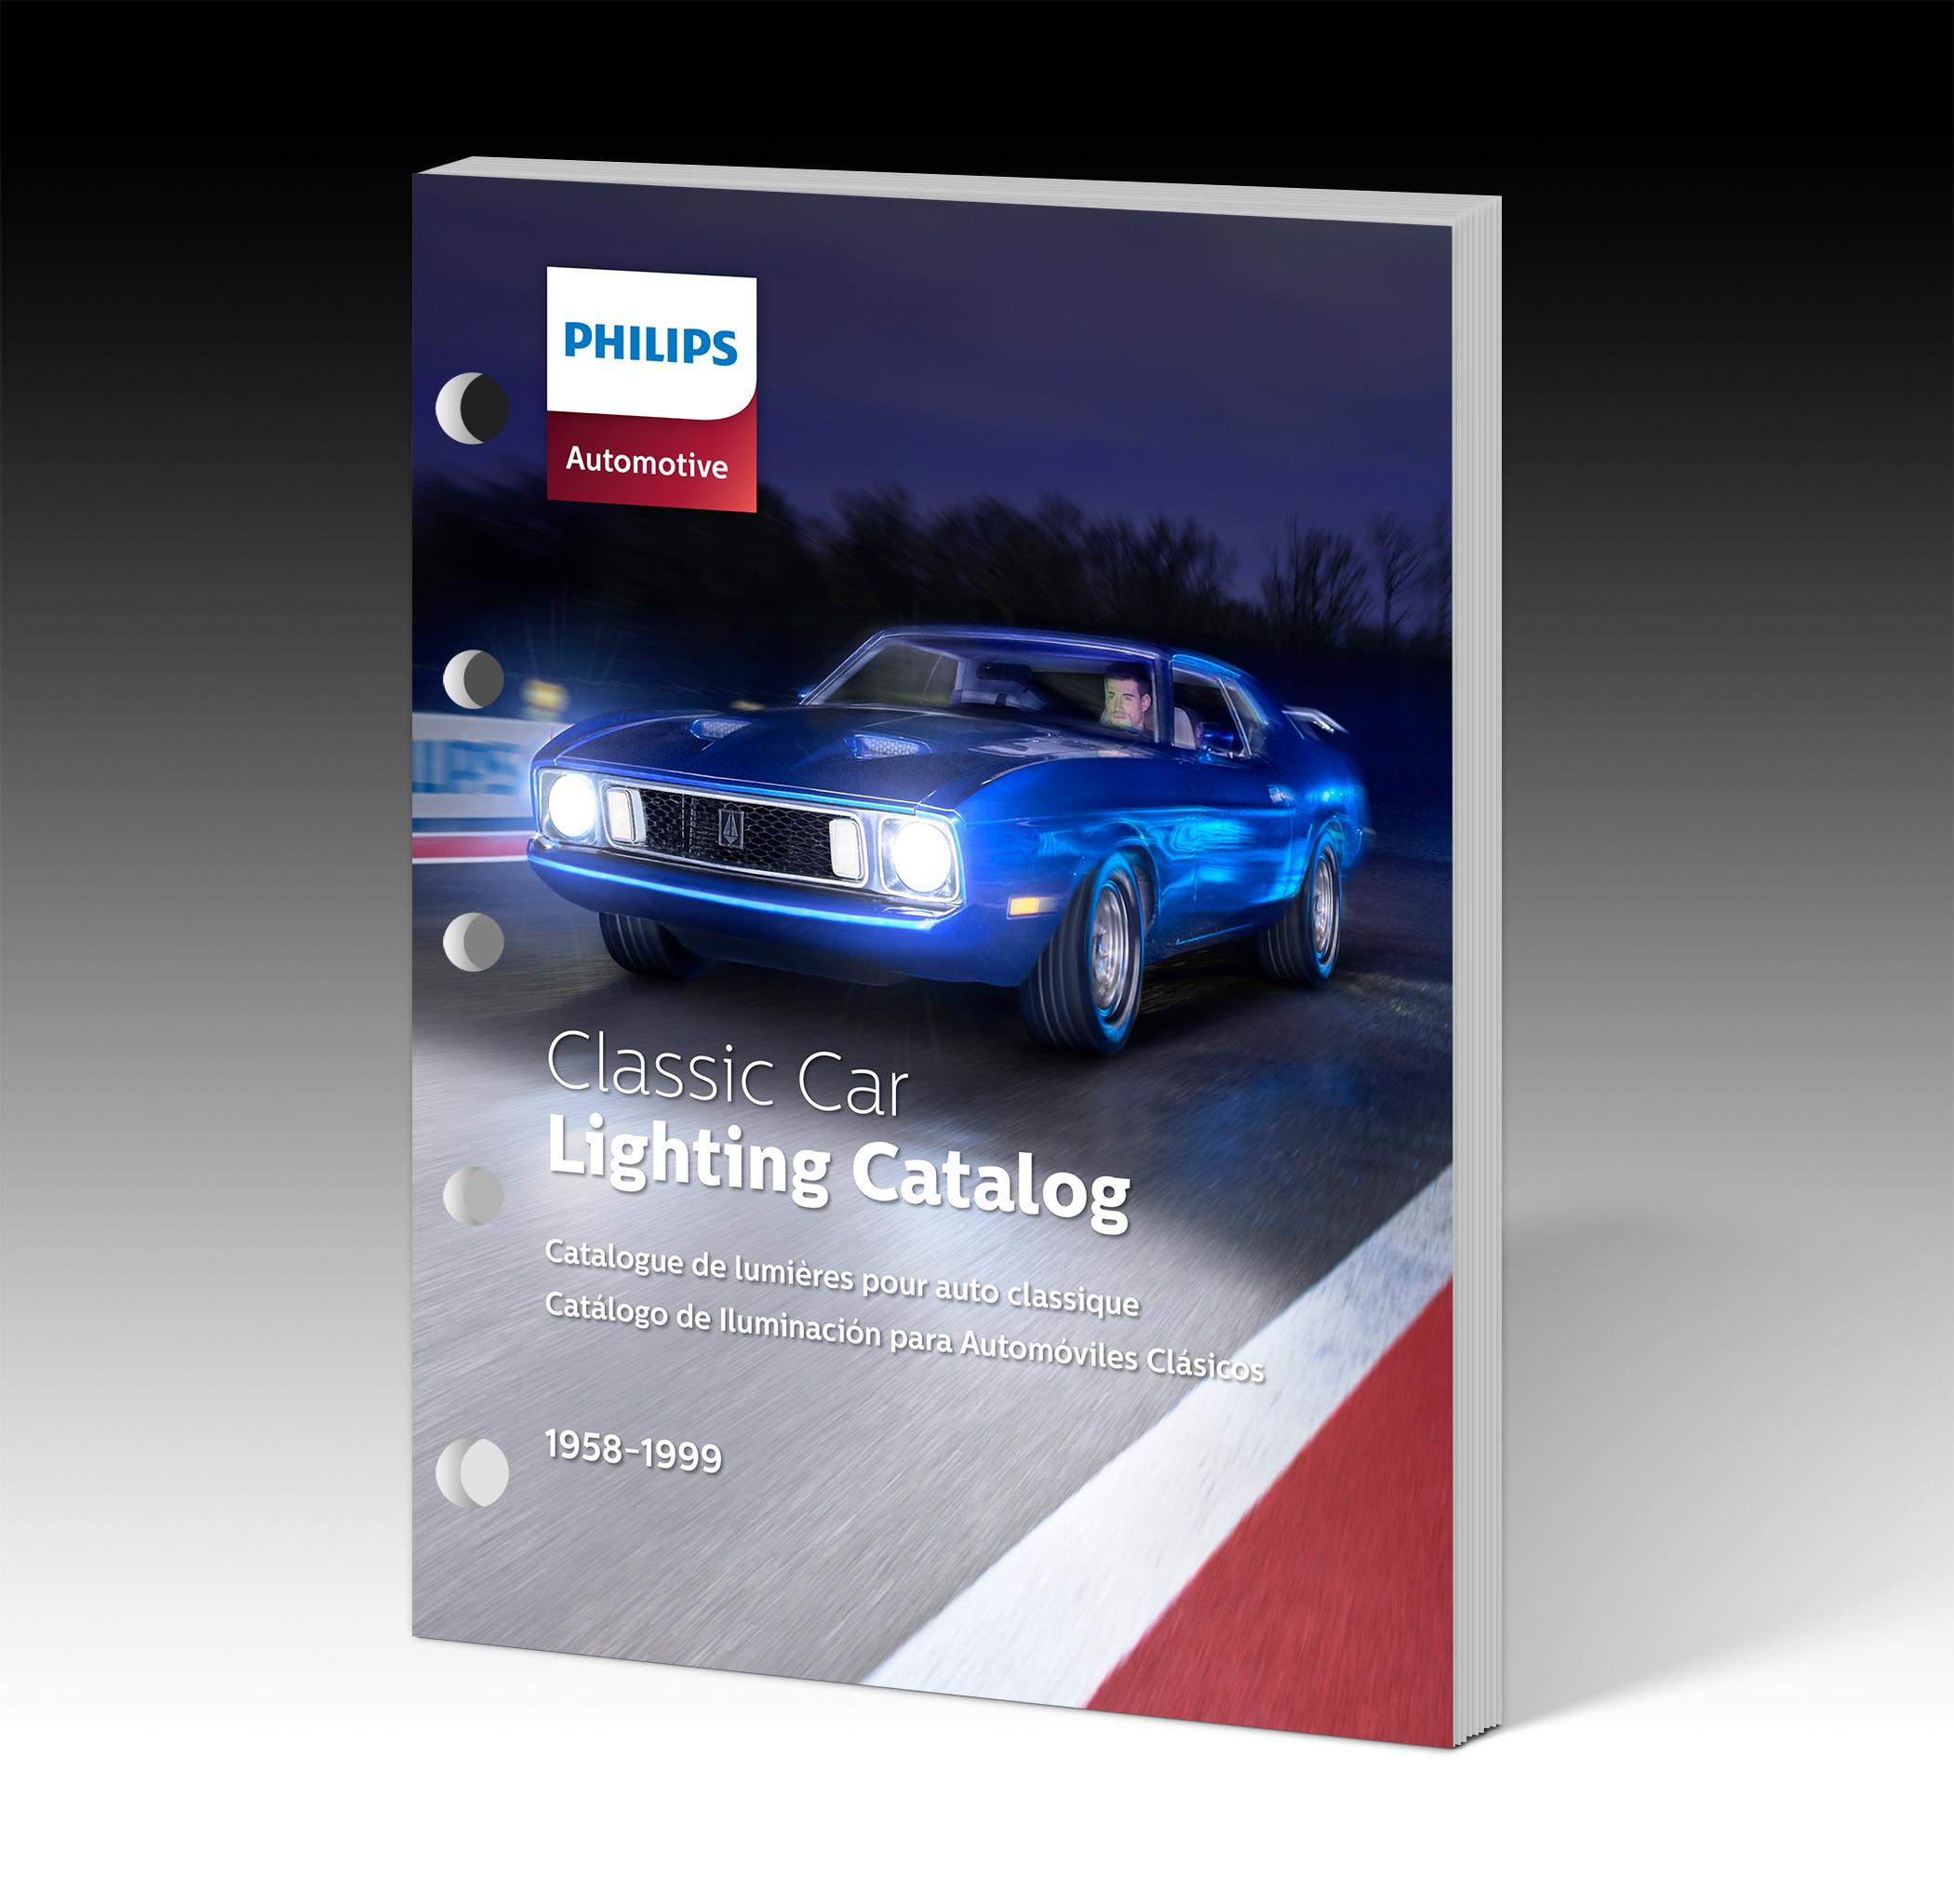 Philips Automotive Classic Car Lighting Catalog